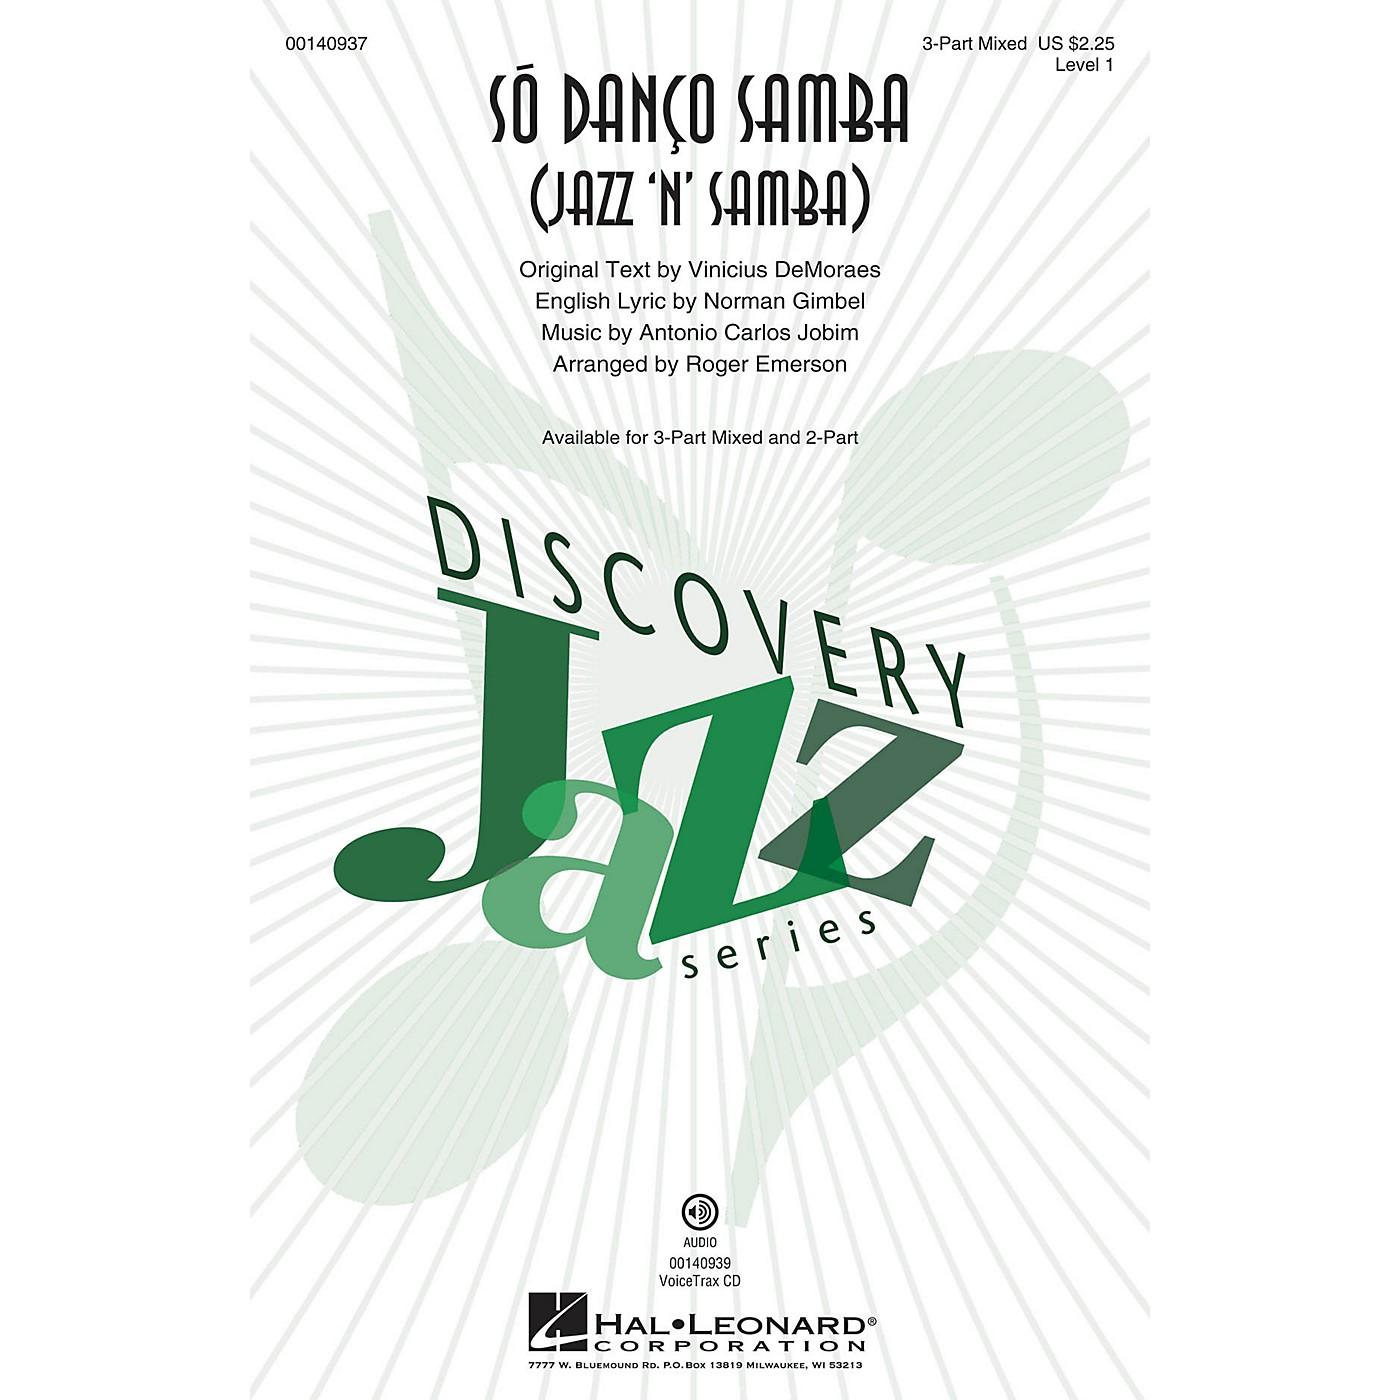 Hal Leonard Só Danço Samba (Jazz 'n' Samba) (Discovery Level 1) 3-Part Mixed arranged by Roger Emerson thumbnail